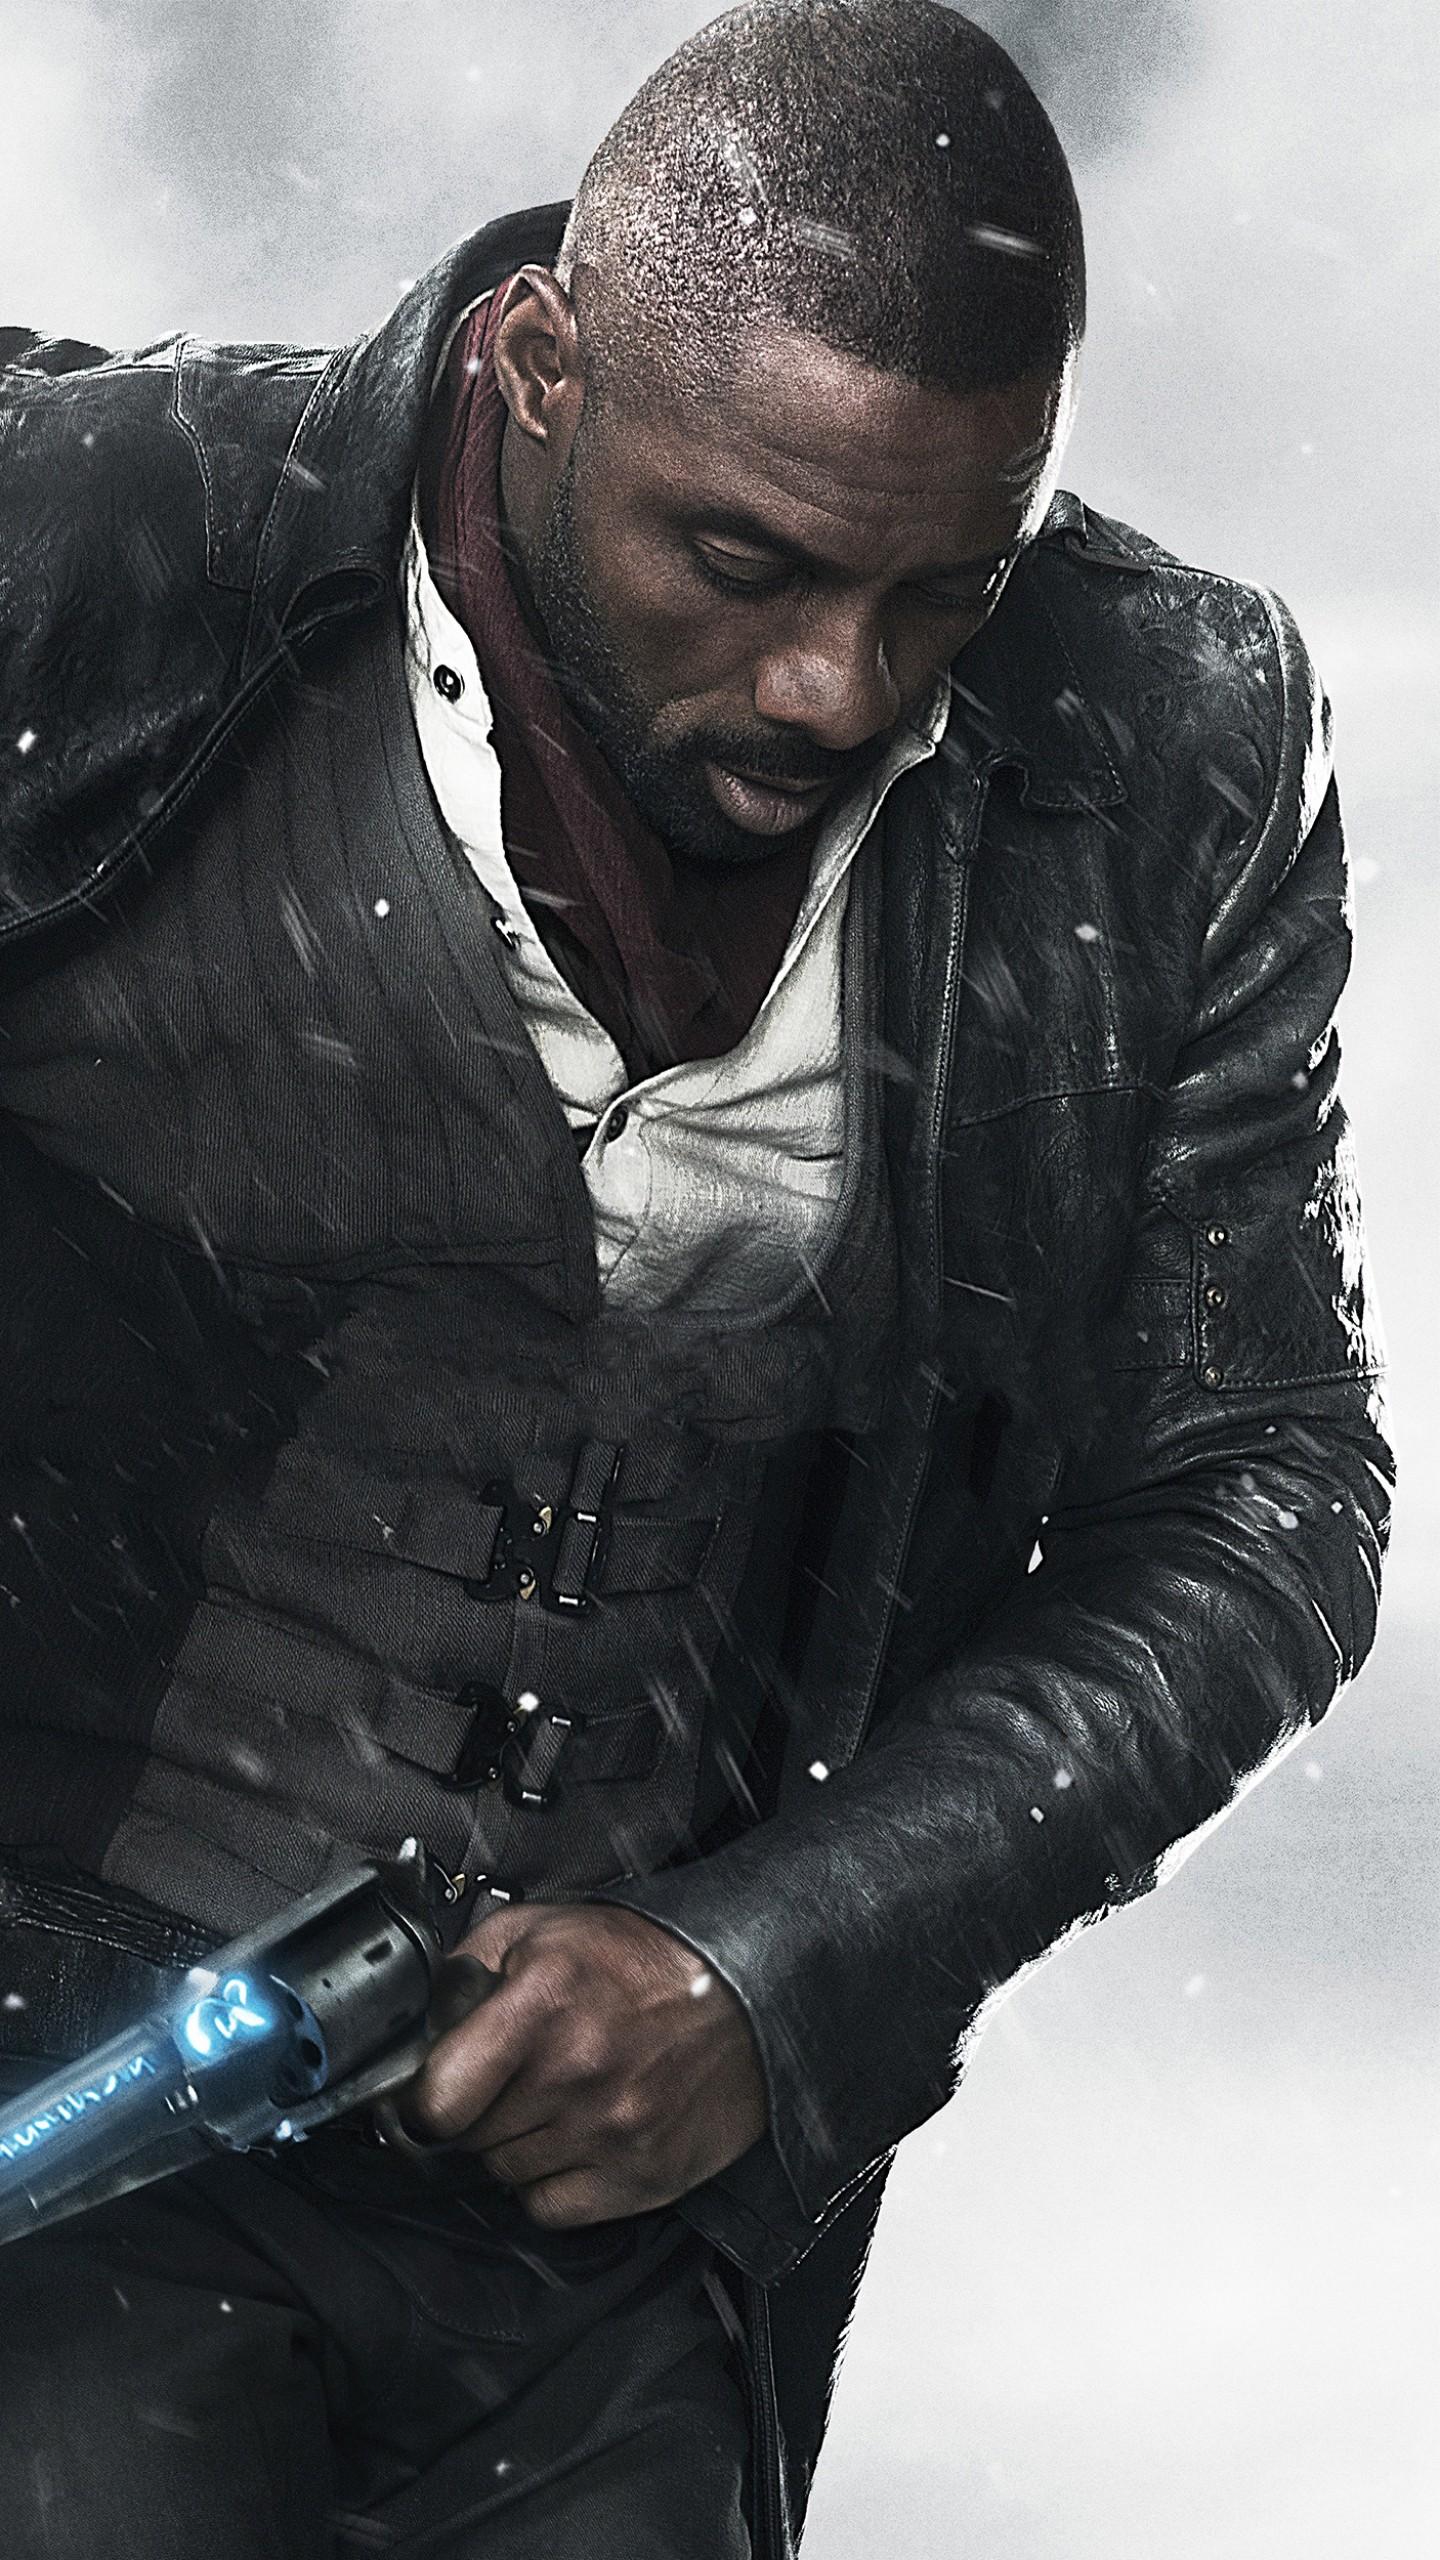 Hd Wallpaper Of Girls Wallpaper The Dark Tower Idris Elba 4k Movies 14479